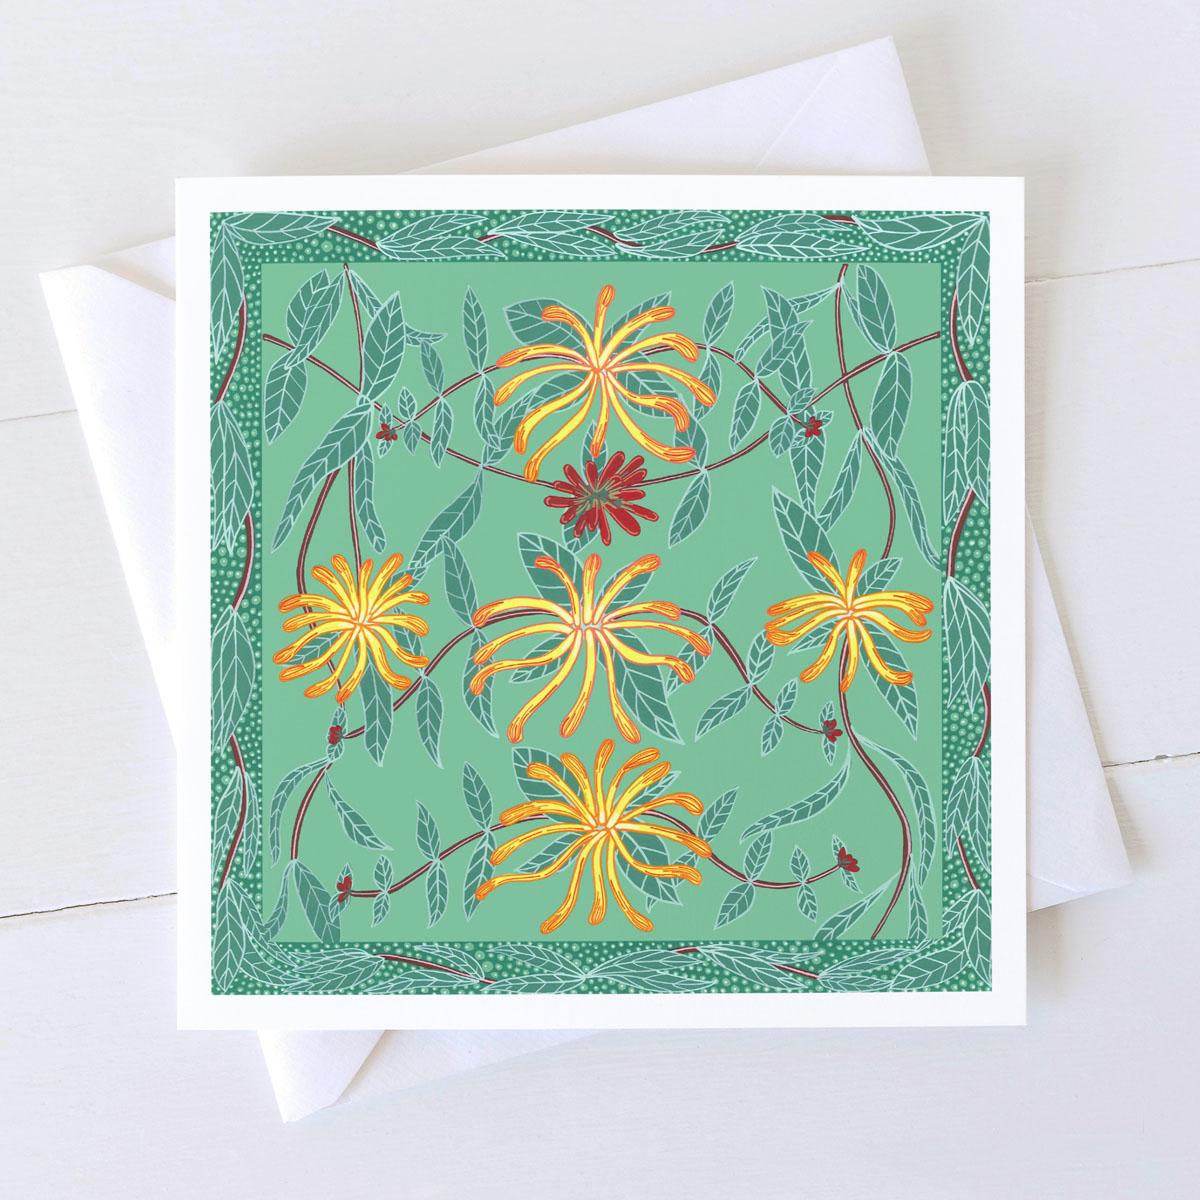 Honeysuckle Wild Flower Greeting Card